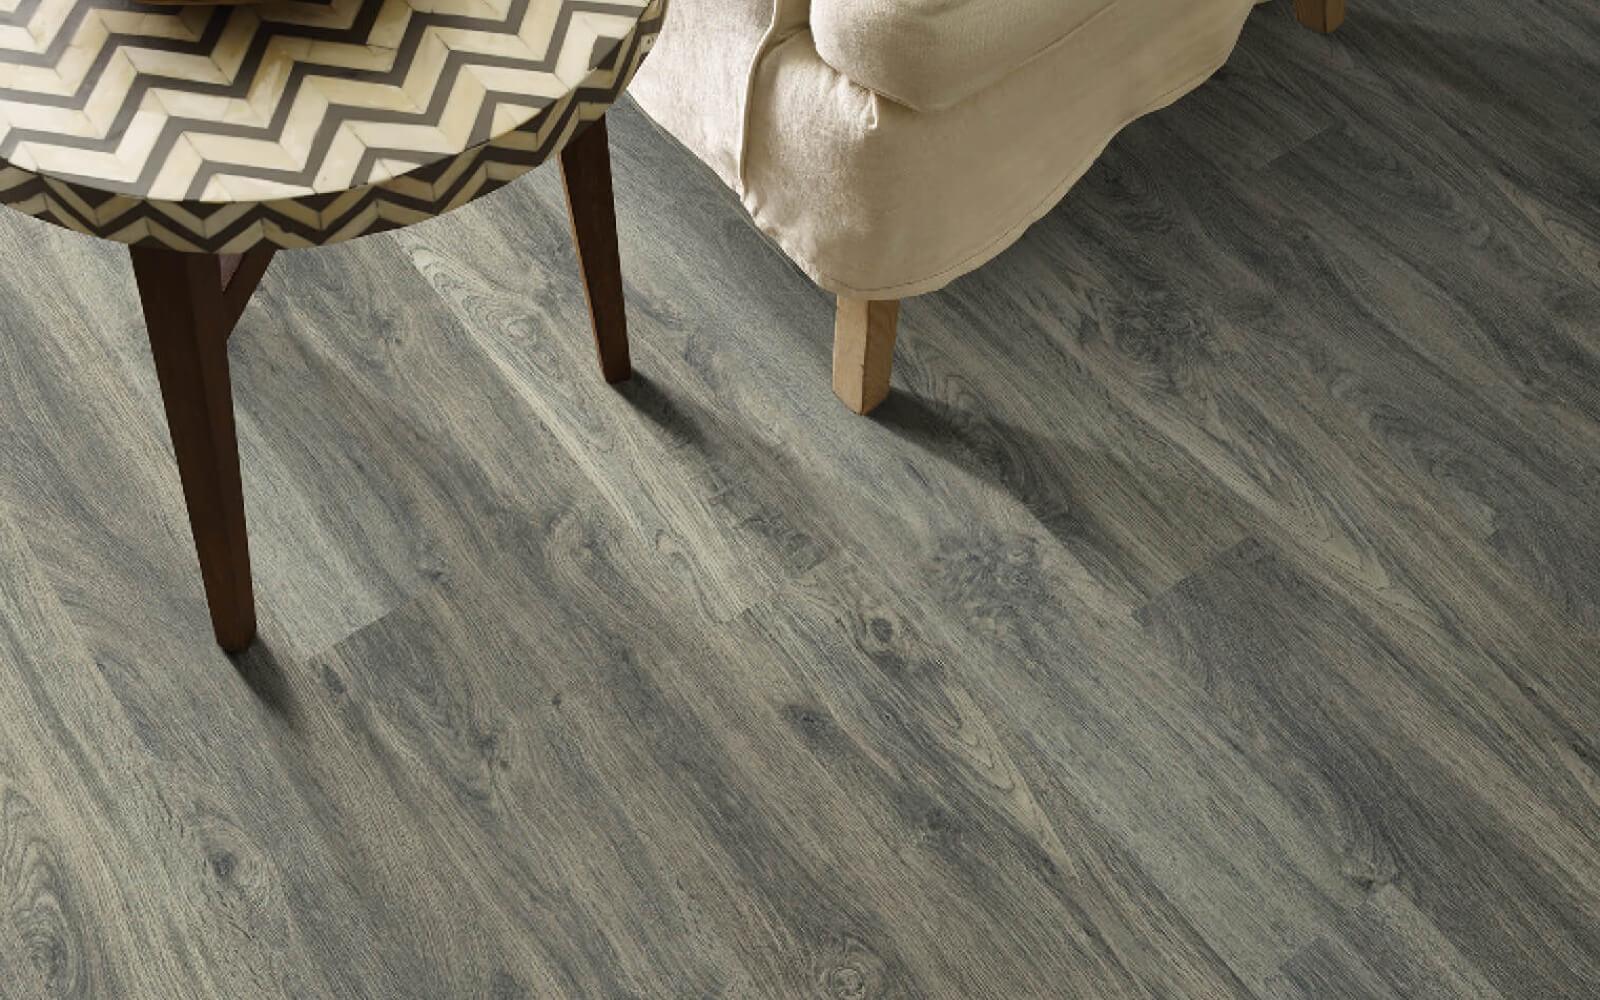 Gold Coast Shaw laminate | Flooring by Wilson's Carpet Plus